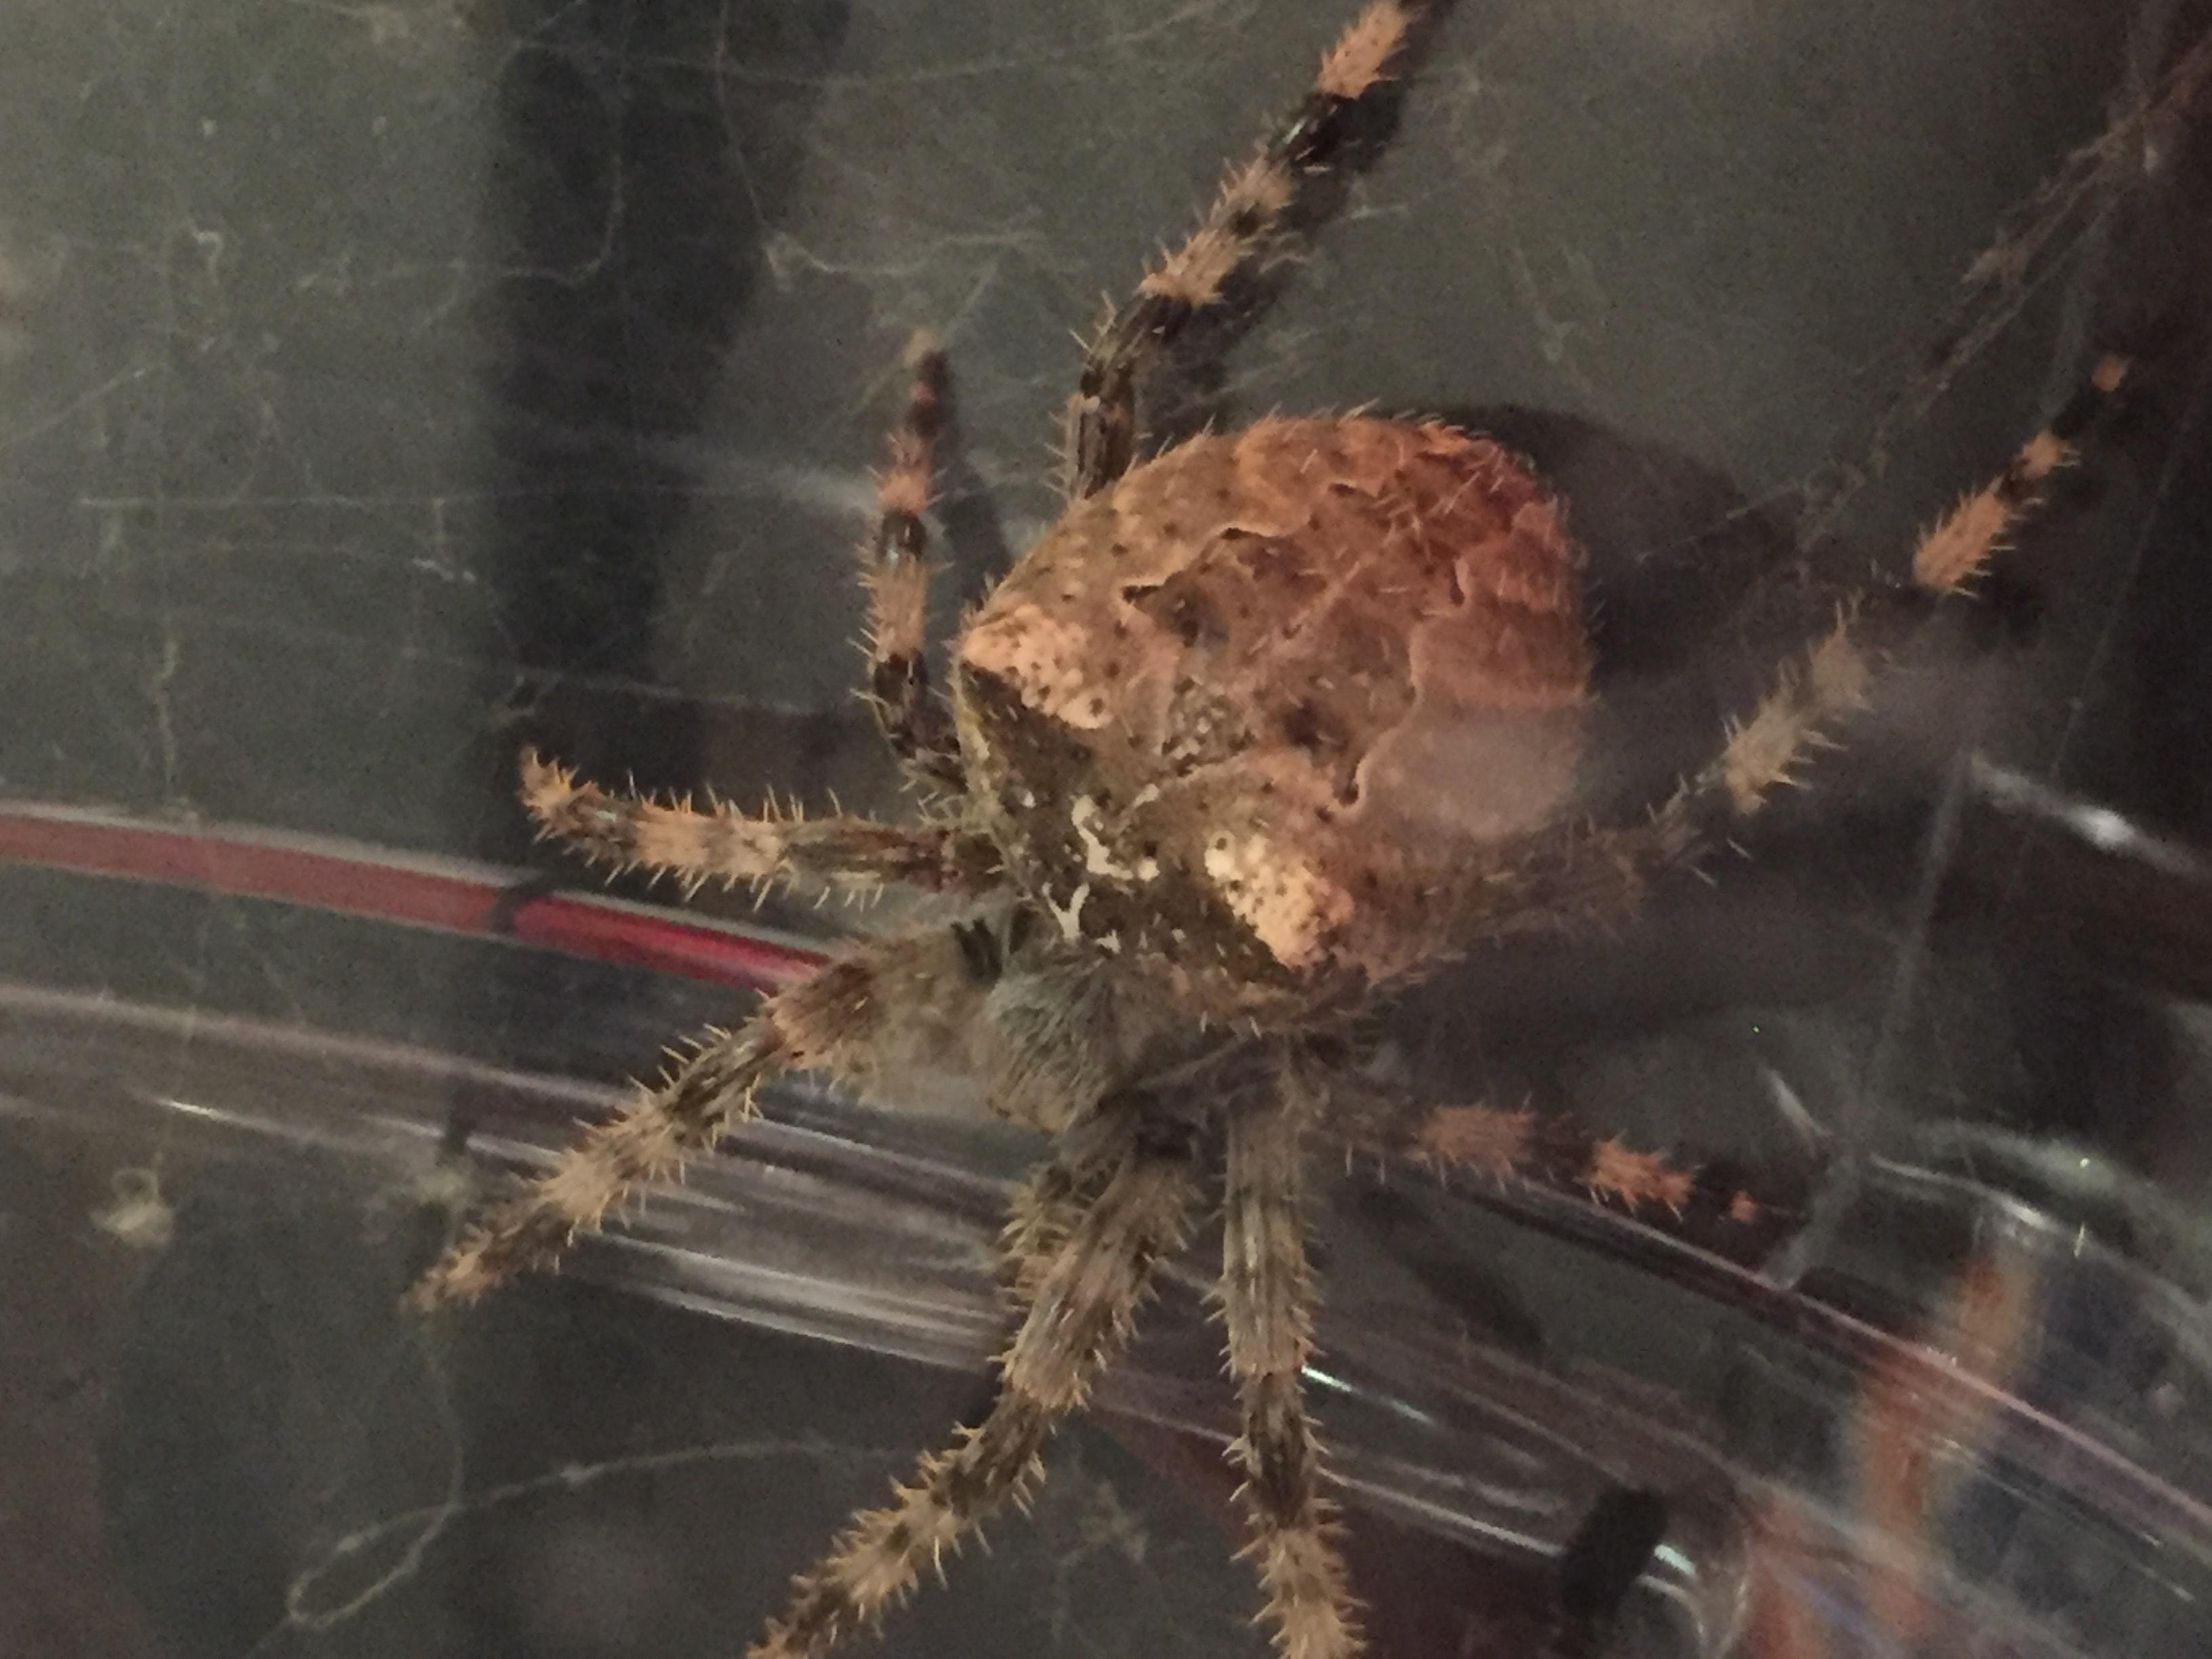 Picture of Araneus gemmoides (Cat-faced Spider) - Female - Dorsal